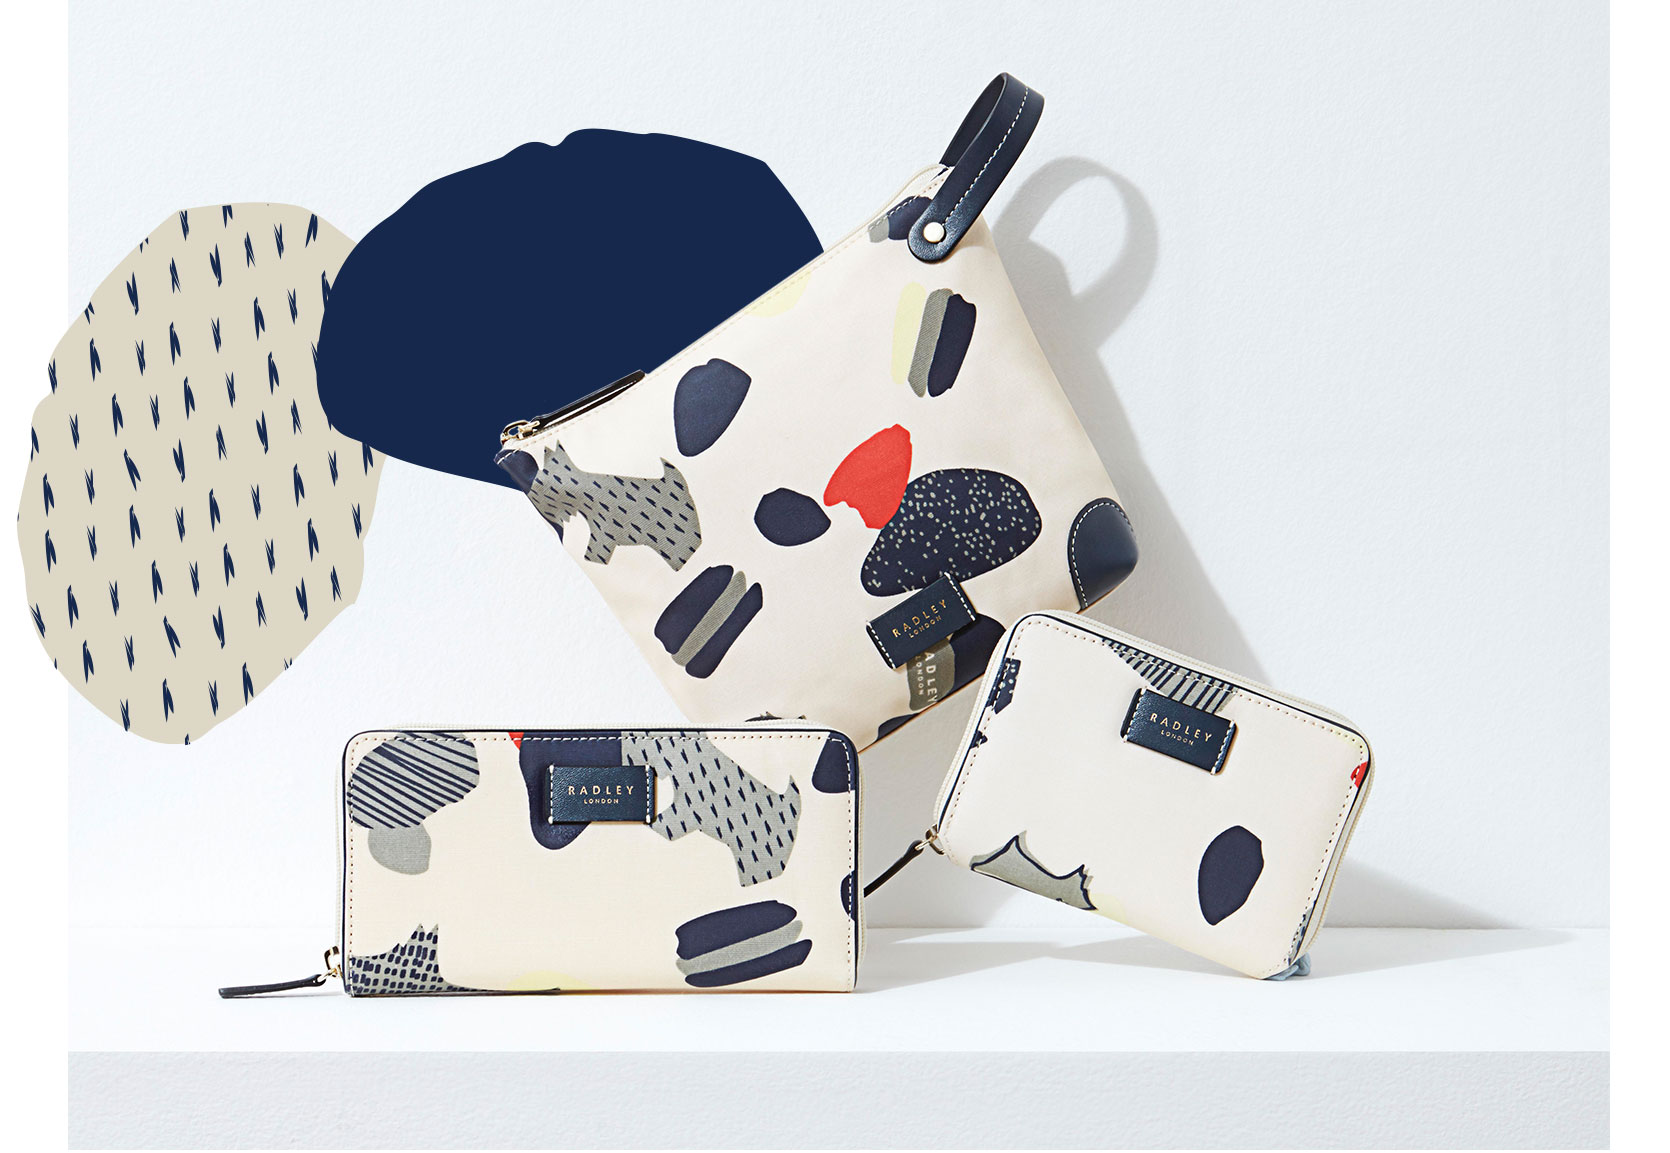 radley-non-leather-print-scottie-dog-cosmetic-case-pouches-purse